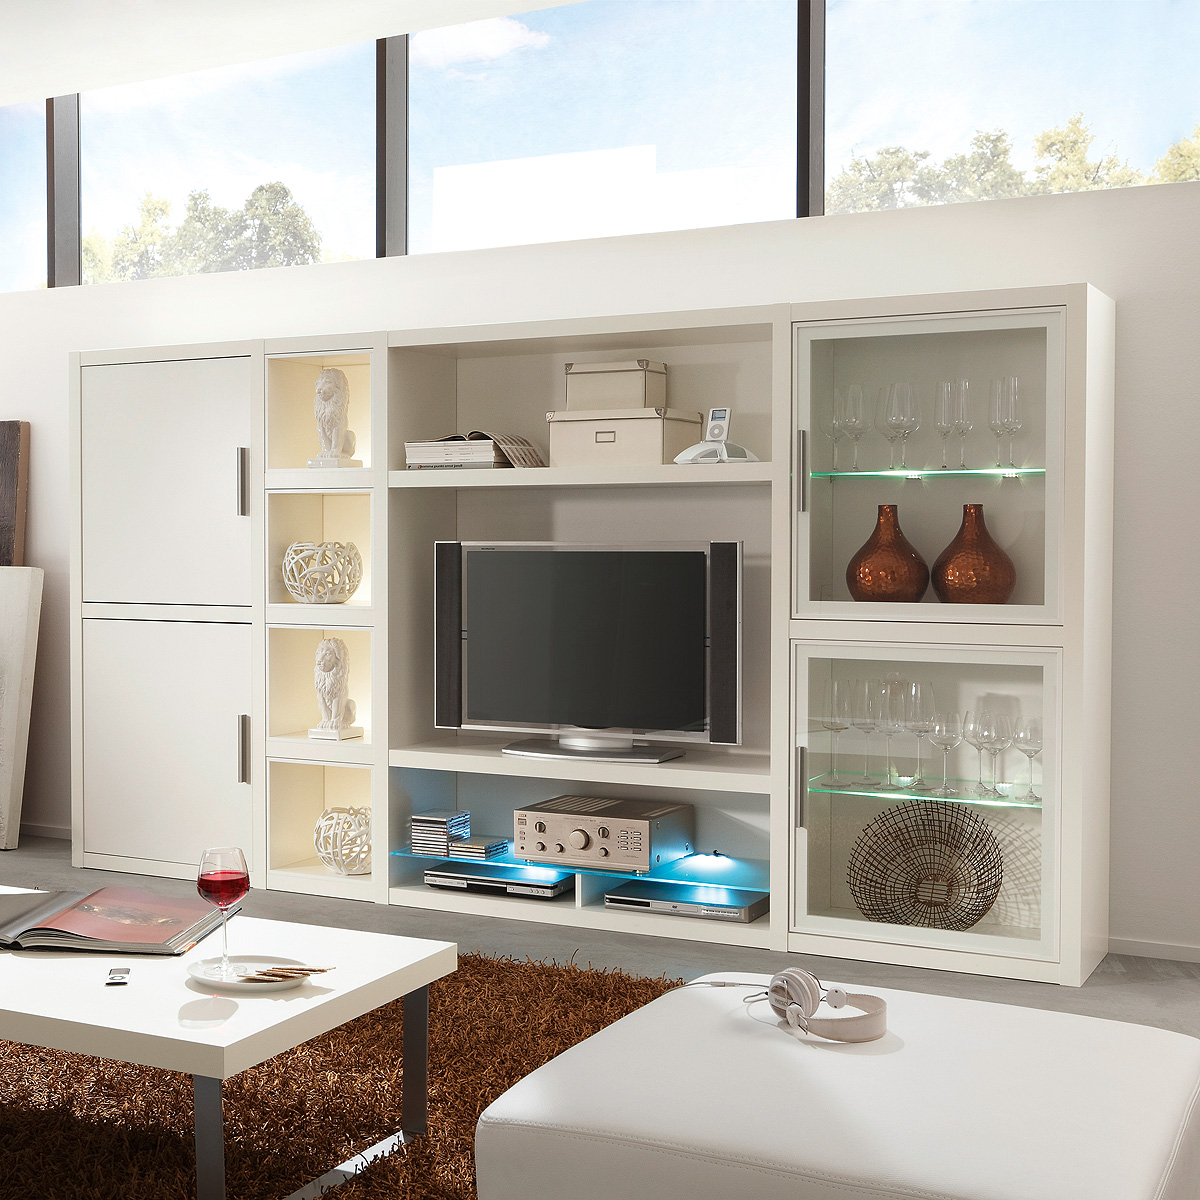 wohnwand comos anbauwand wohnzimmer wohnkombination set in. Black Bedroom Furniture Sets. Home Design Ideas